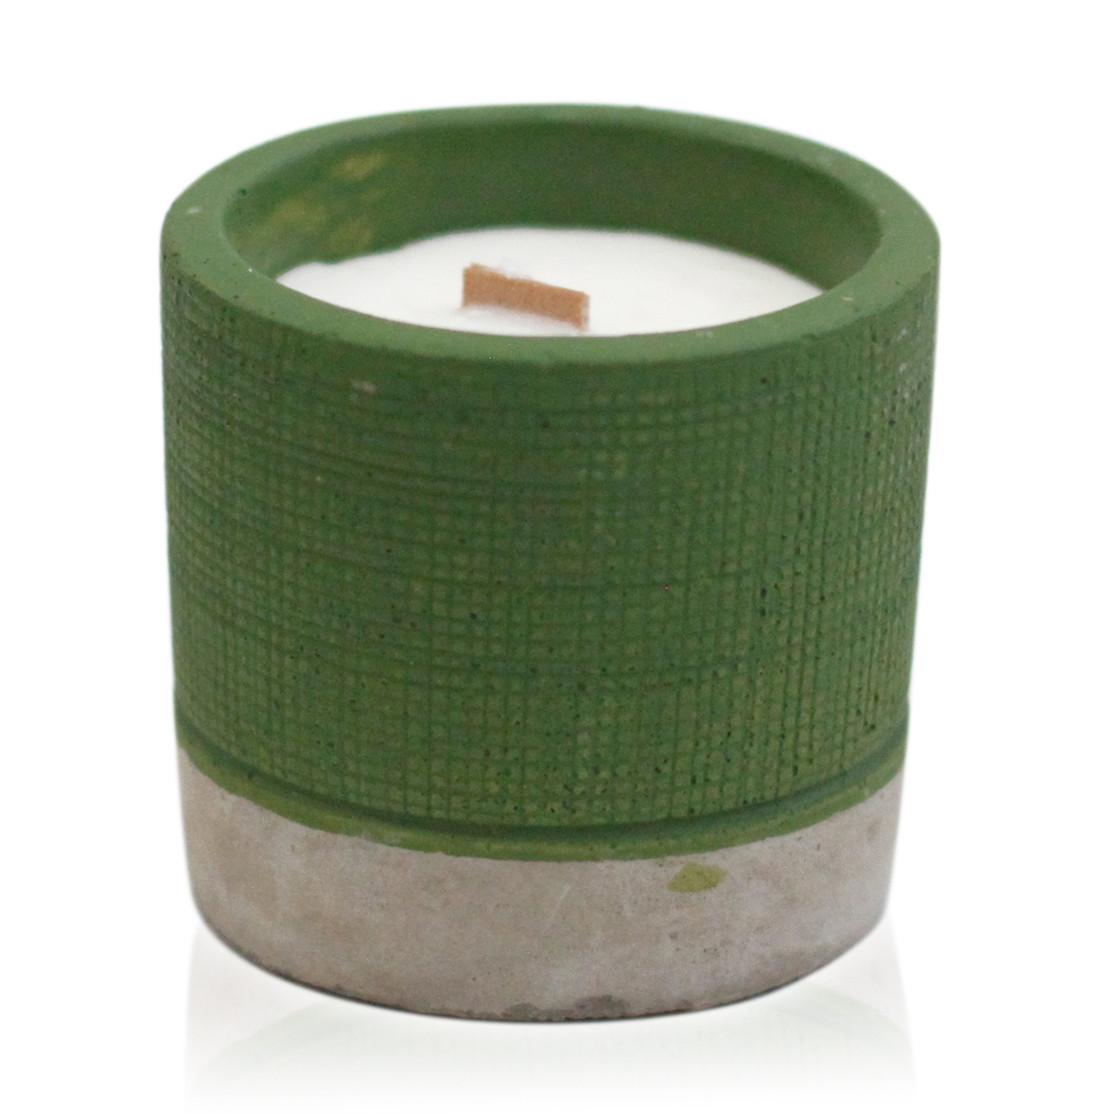 Pot Green Sea Moss and Herbs